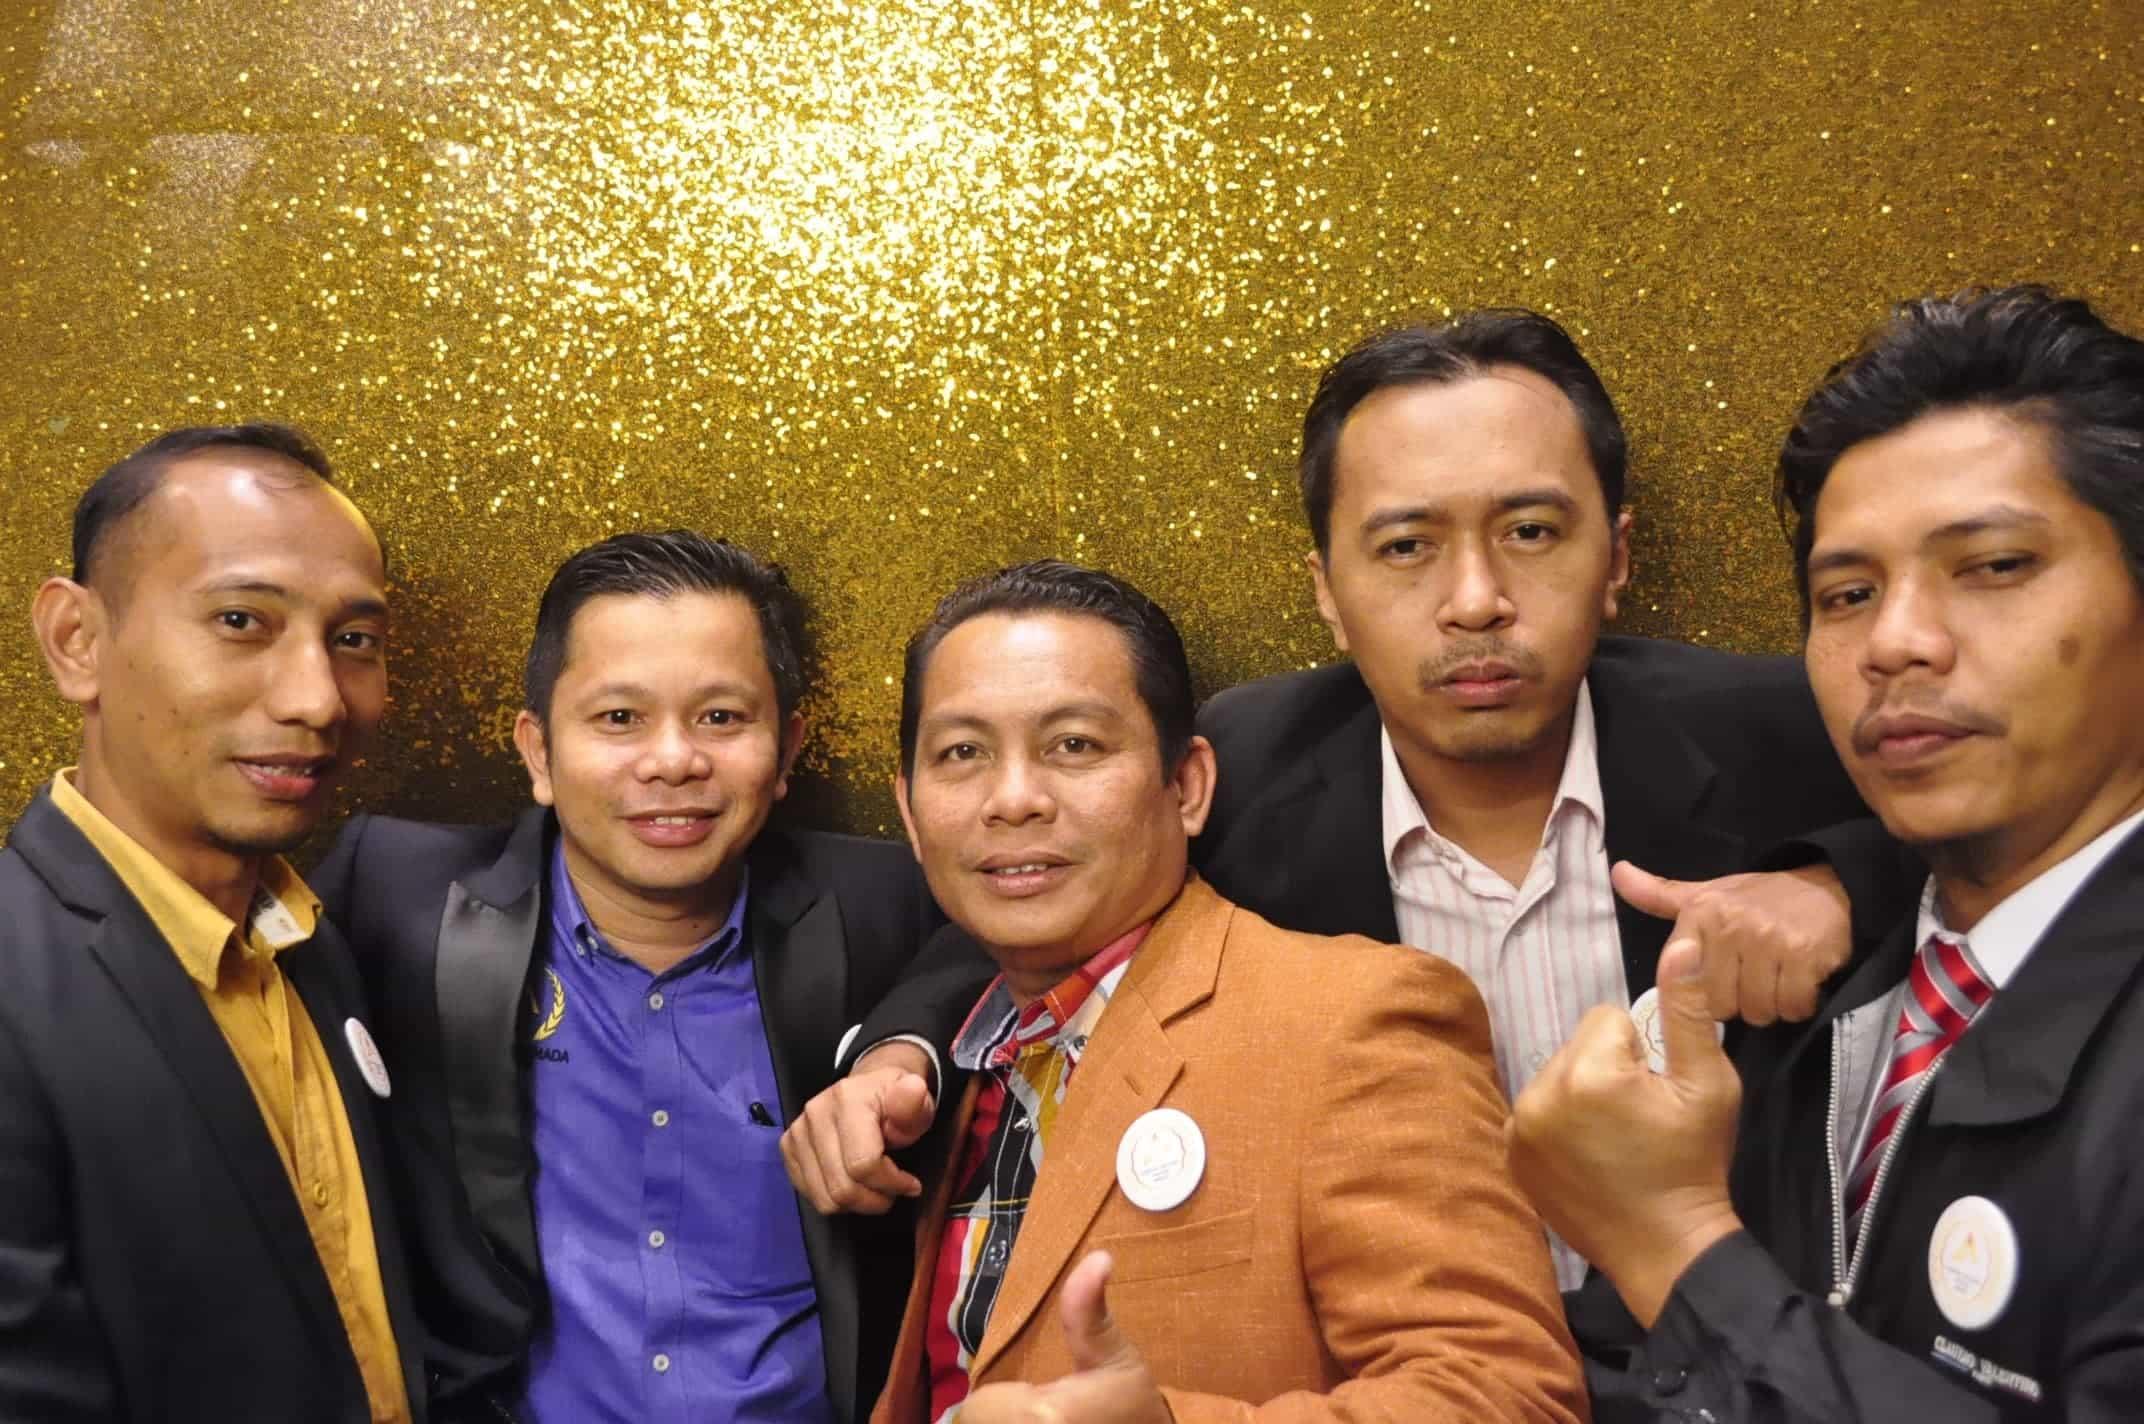 Malam Gala Anggun 2018 (Photobooth) 10